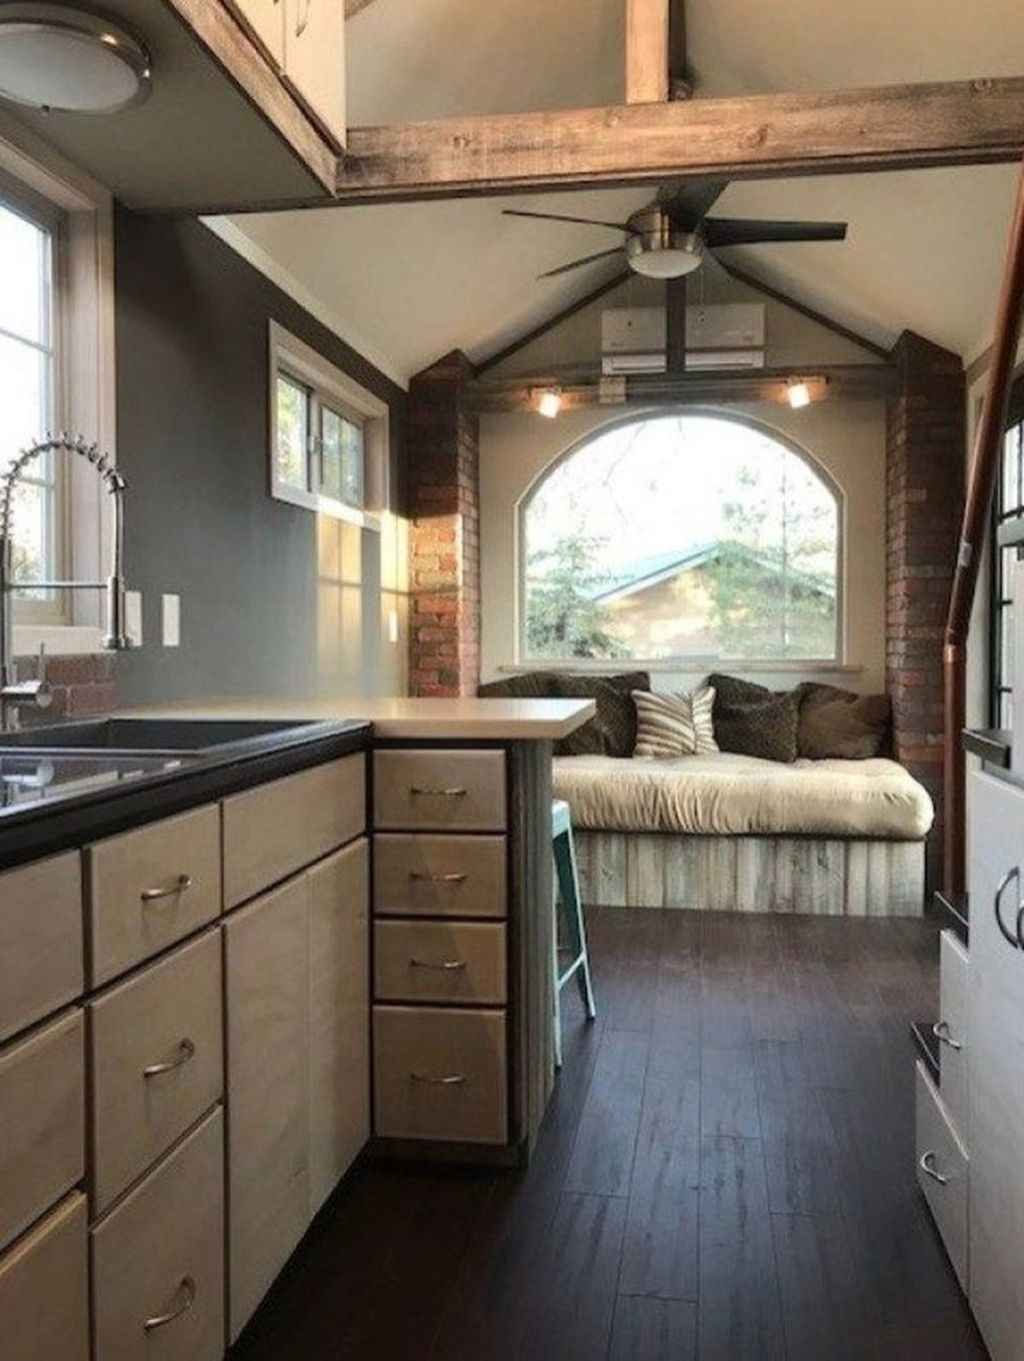 Incredible Tiny House Interior Design Ideas15 Tiny House